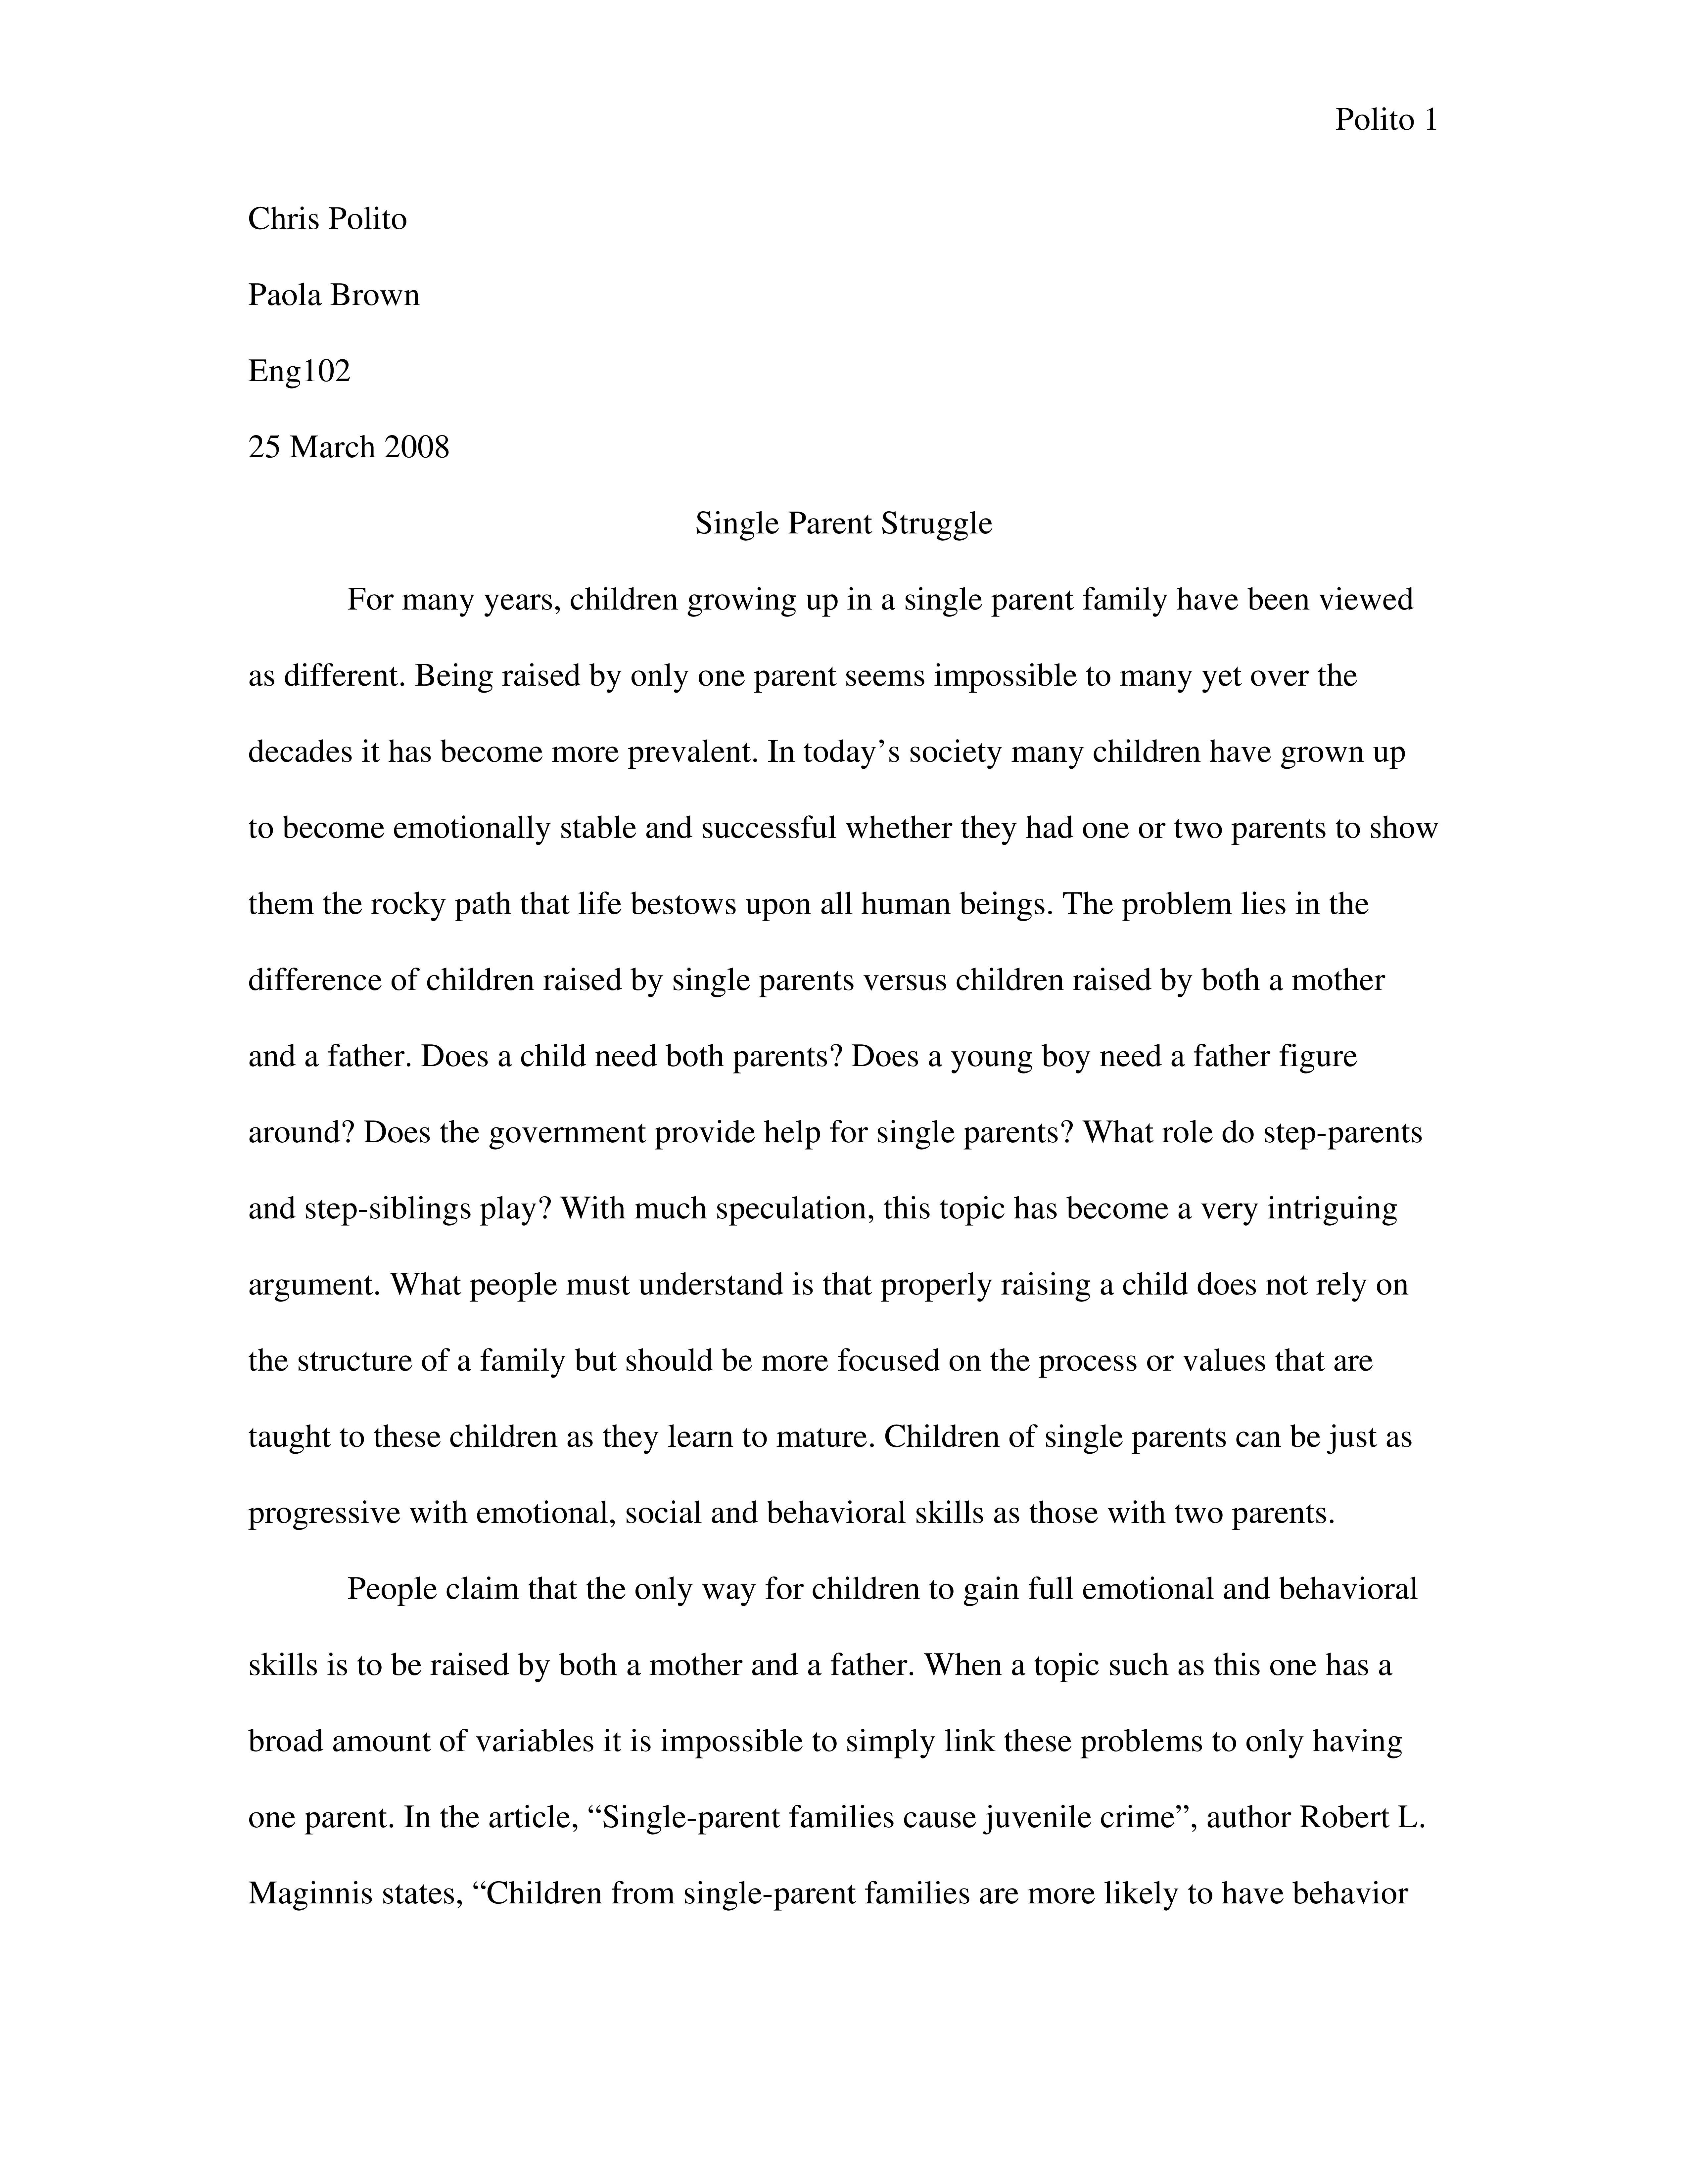 003 Rhetorical Essay Examples Example Unusual Analysis Ap Lang Strategies Full